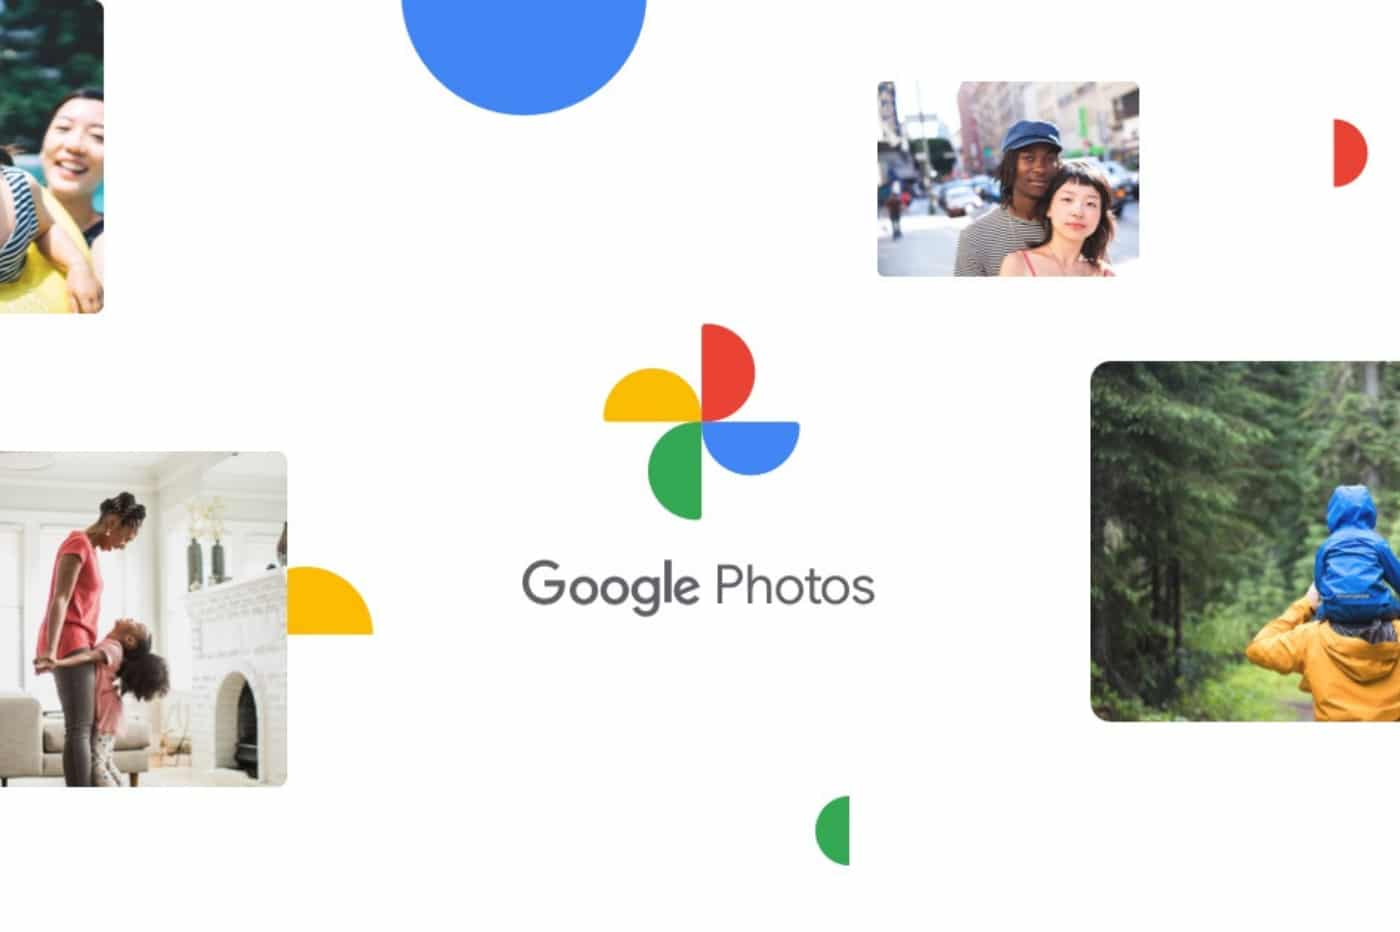 google photos fin stockage illimite gratuit